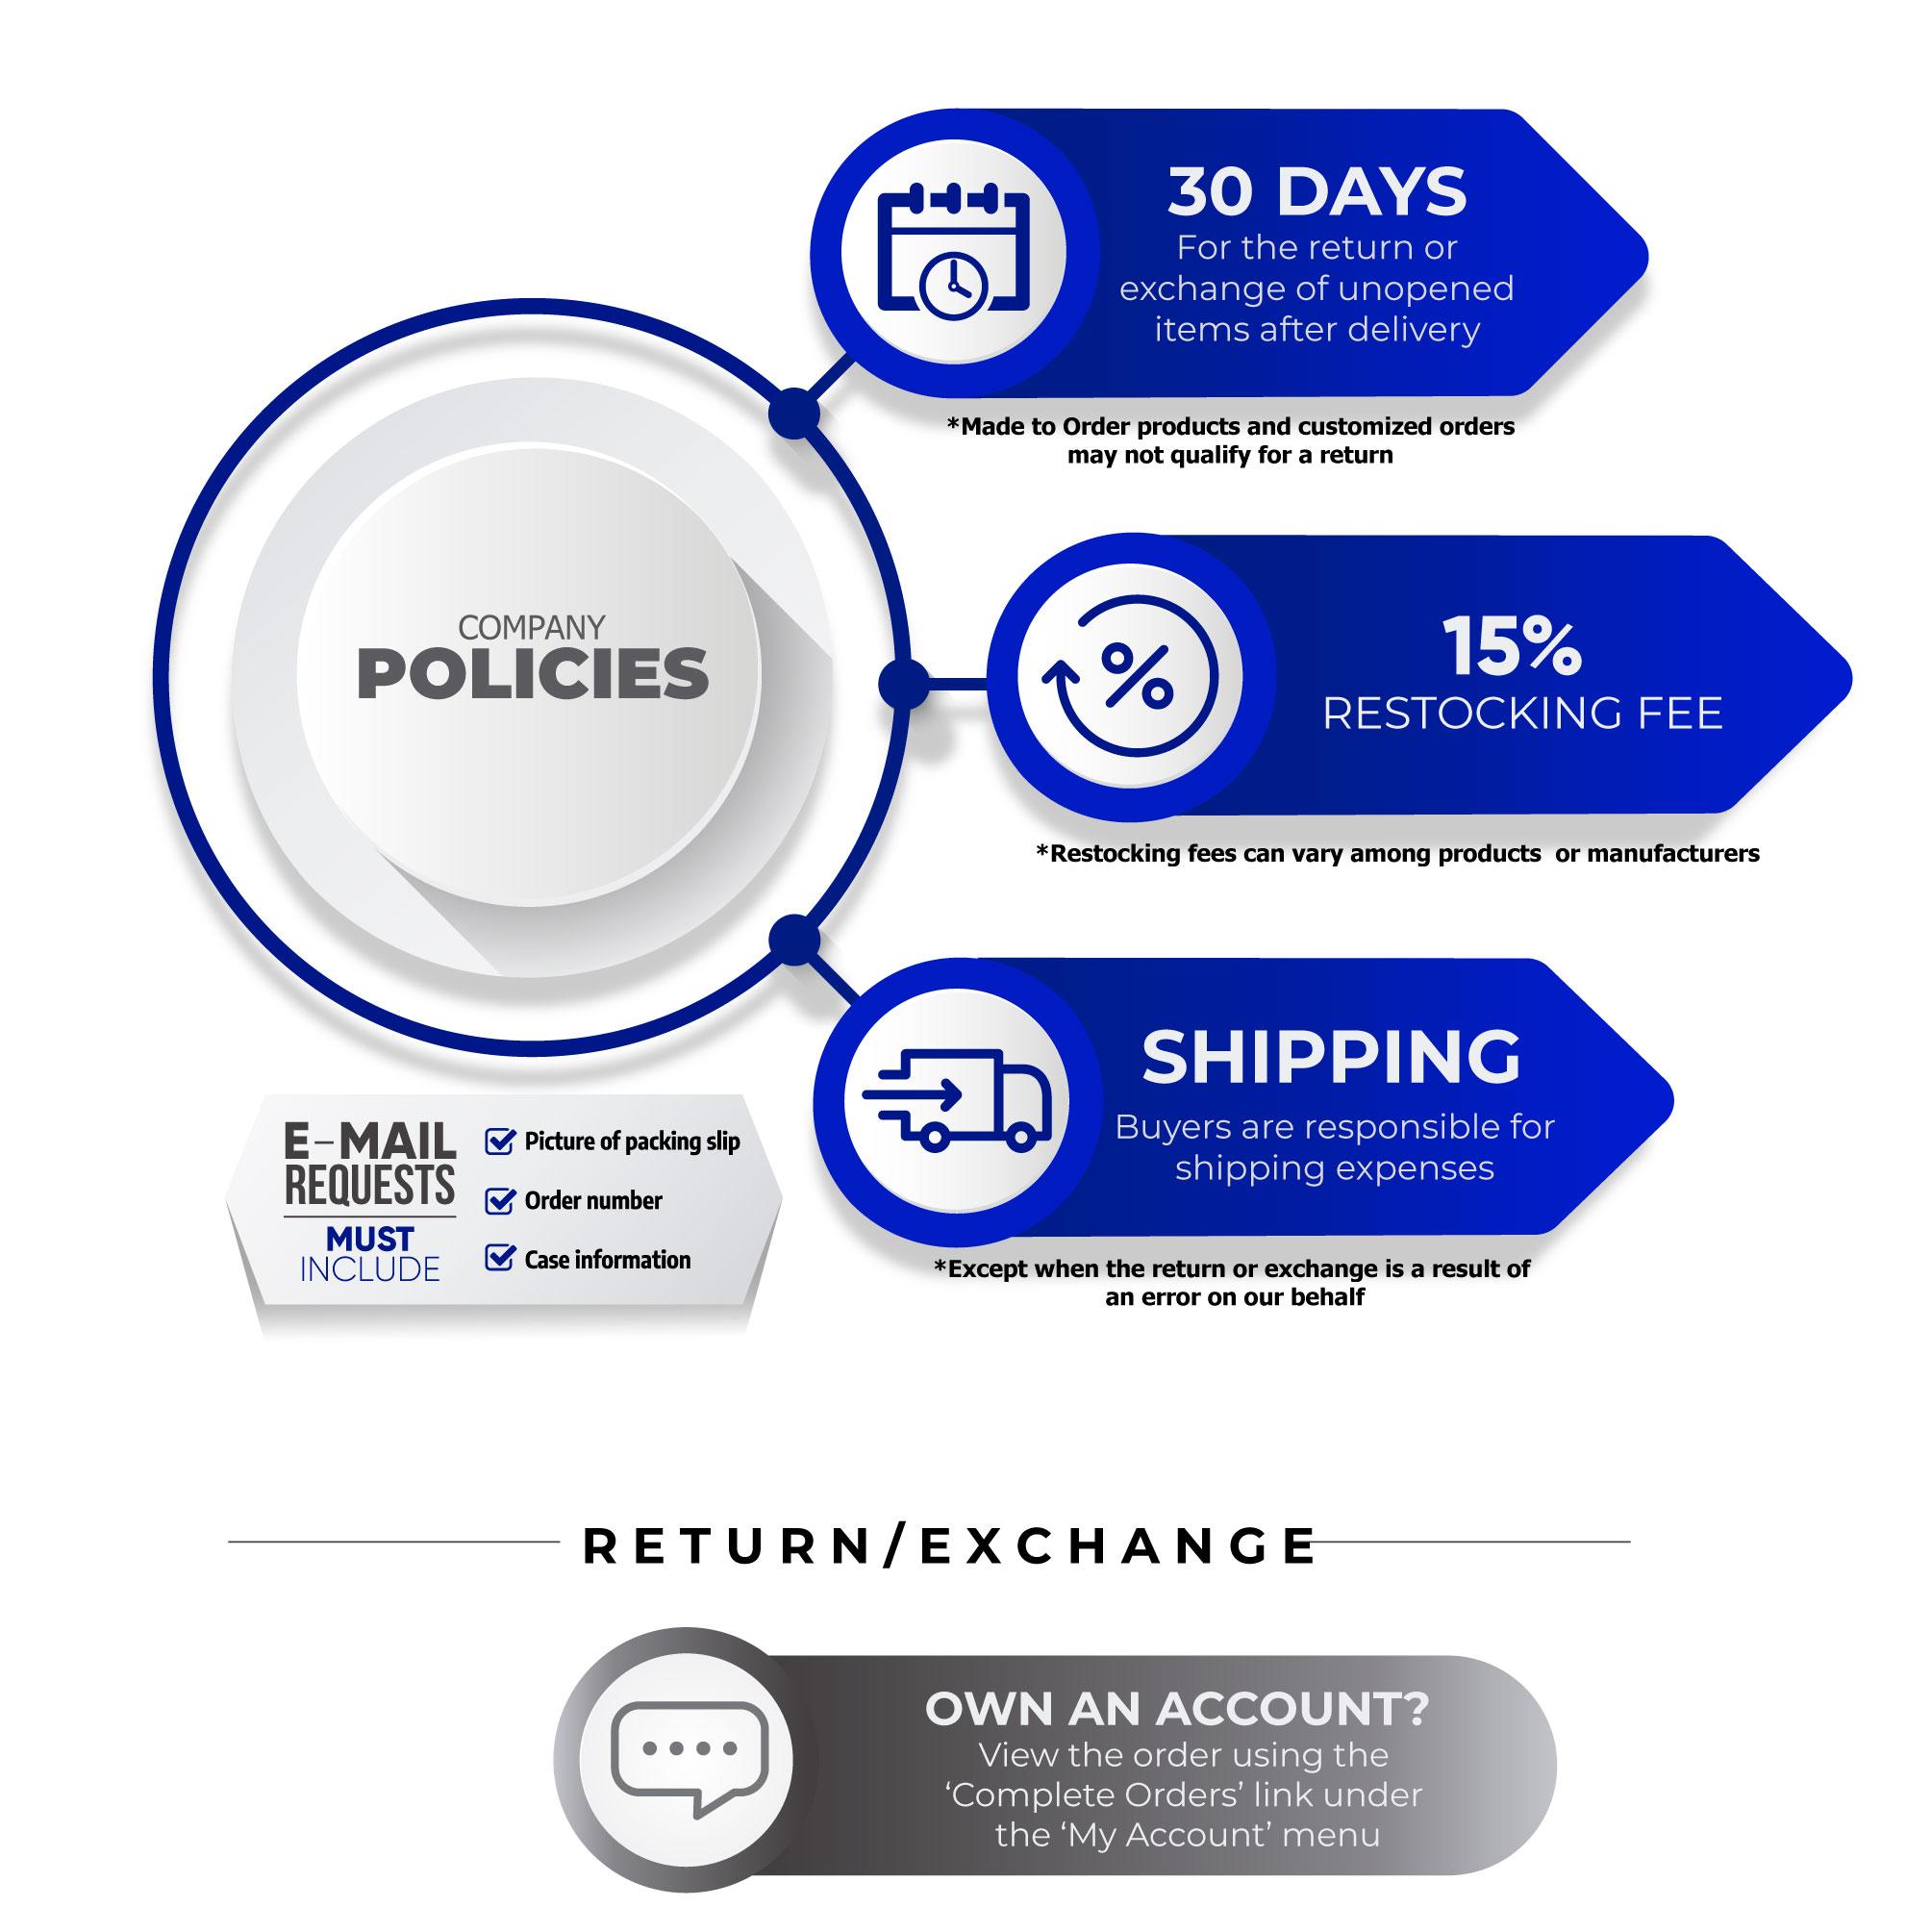 returns-exchange-cancellations-0111.jpg